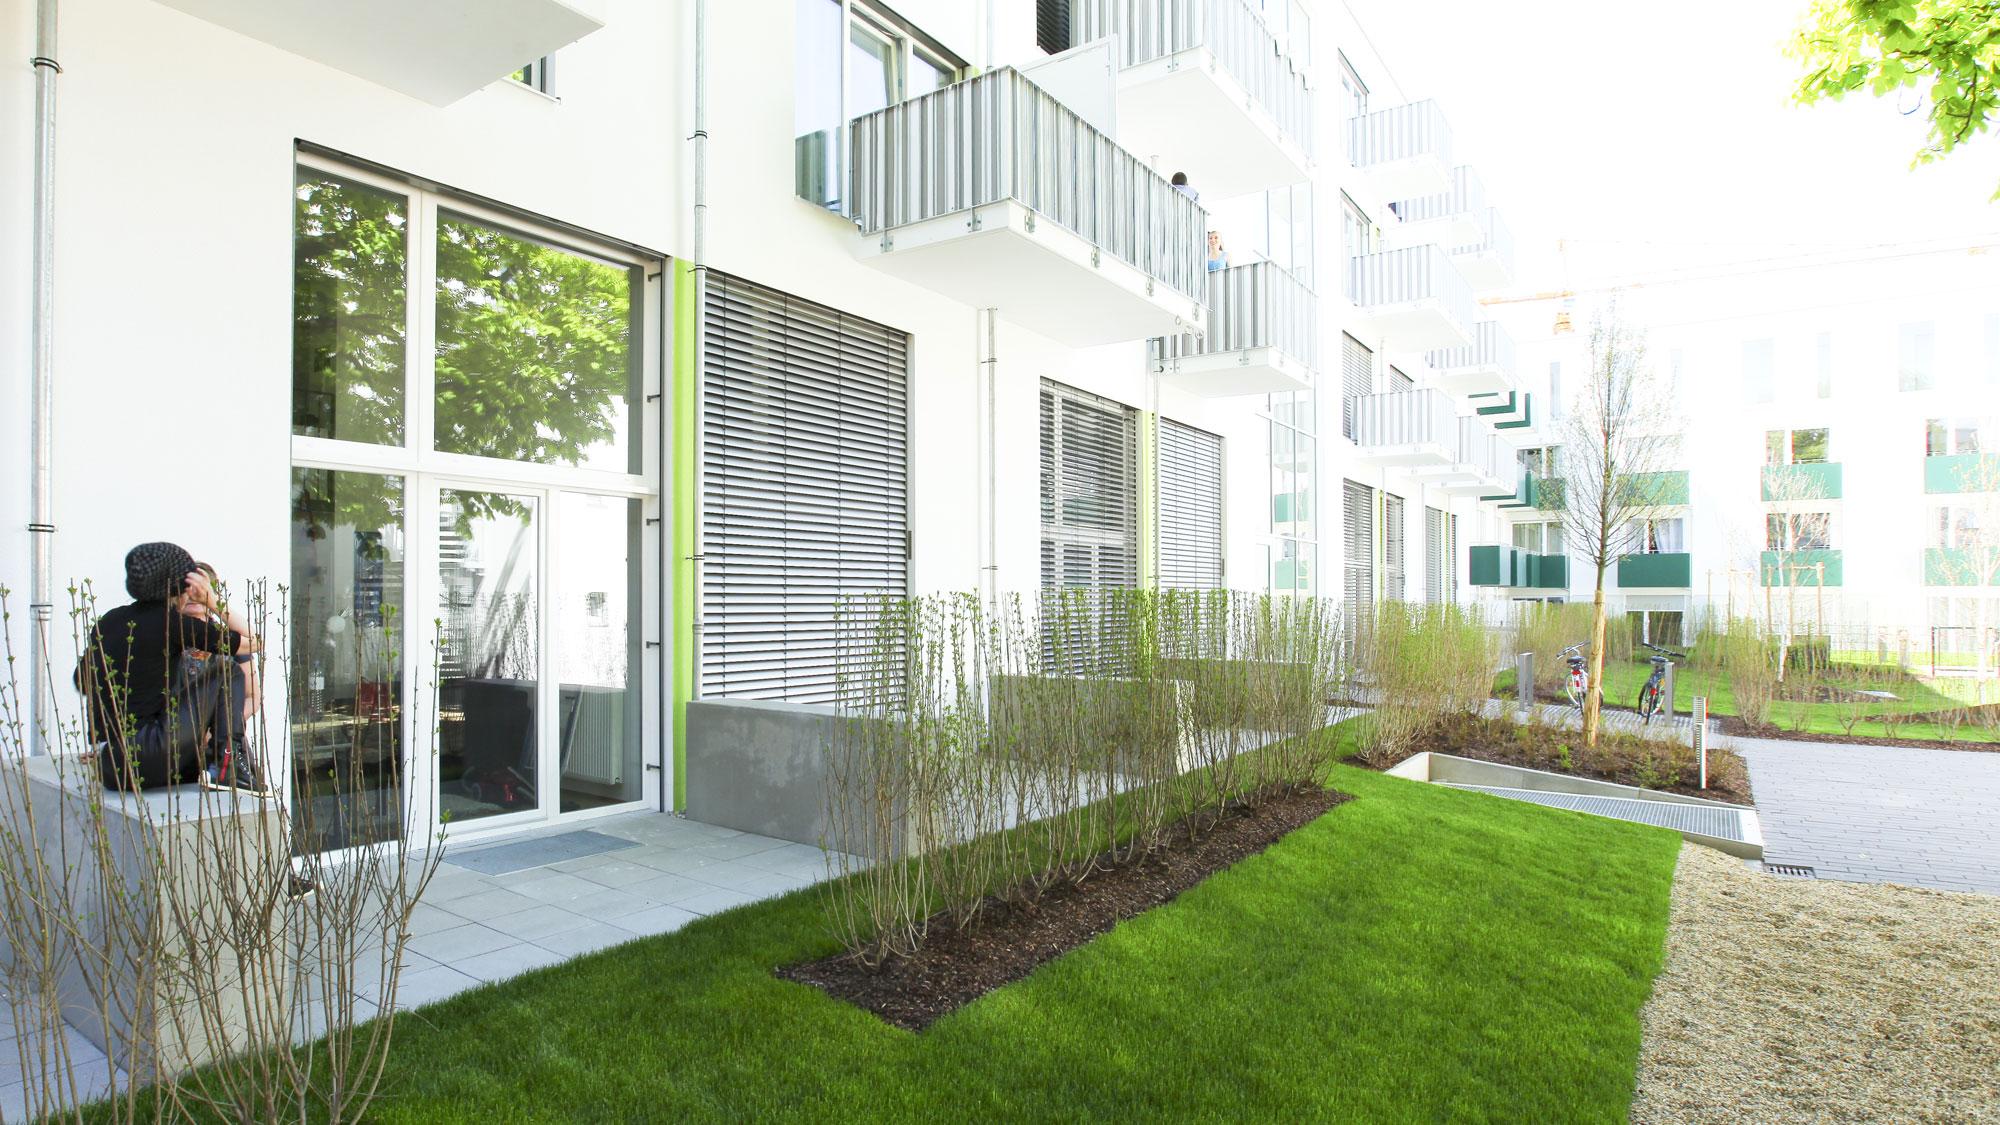 studiosus-2: Gartenterrassen